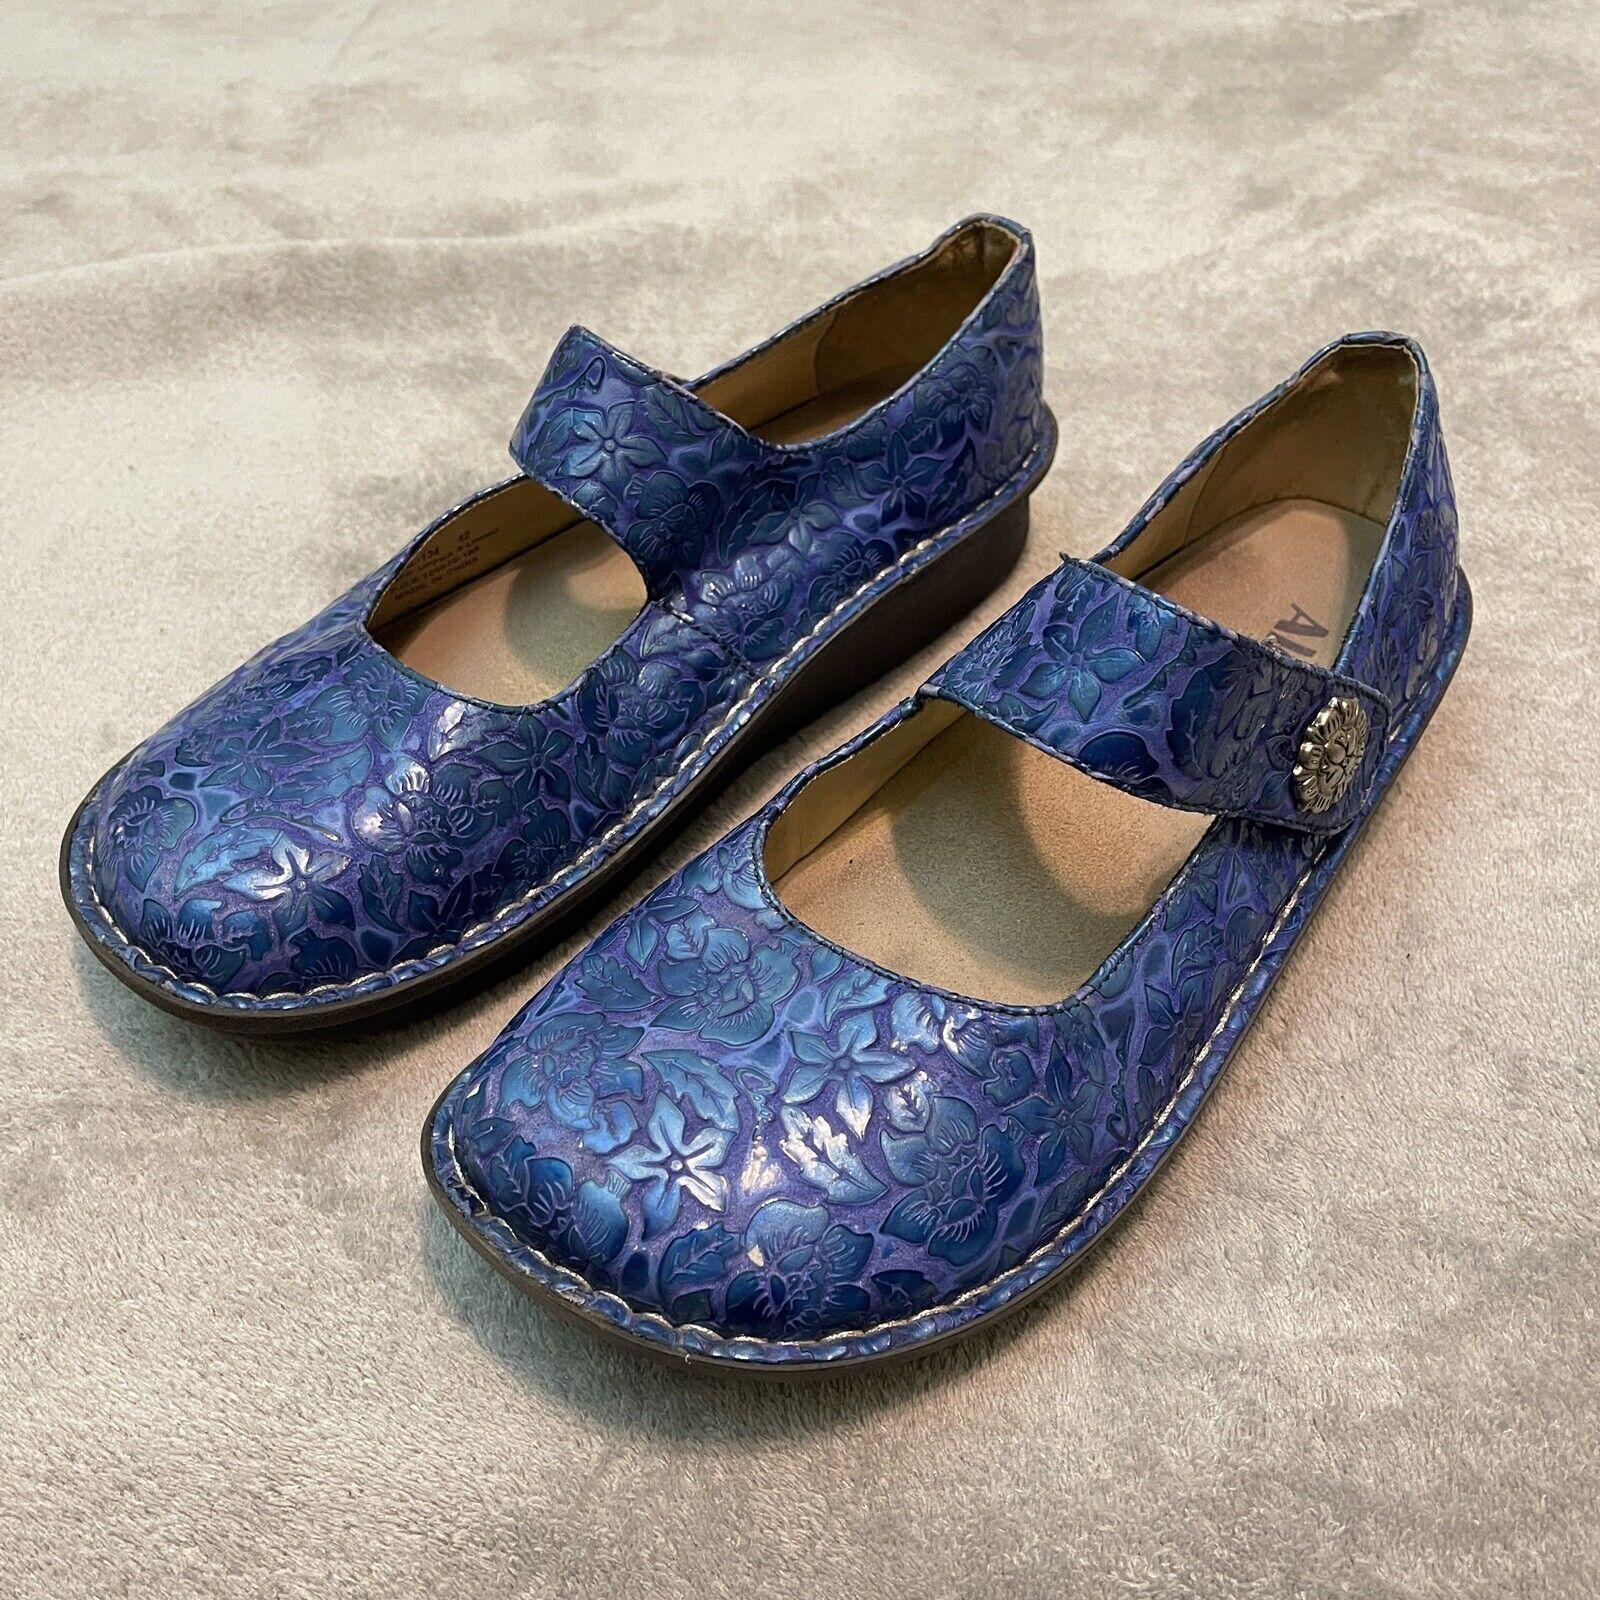 Alegria Mary Jane Size Euro 42 / US 11.5-12 PALOMA BLUE ETCHED PATENT Leather